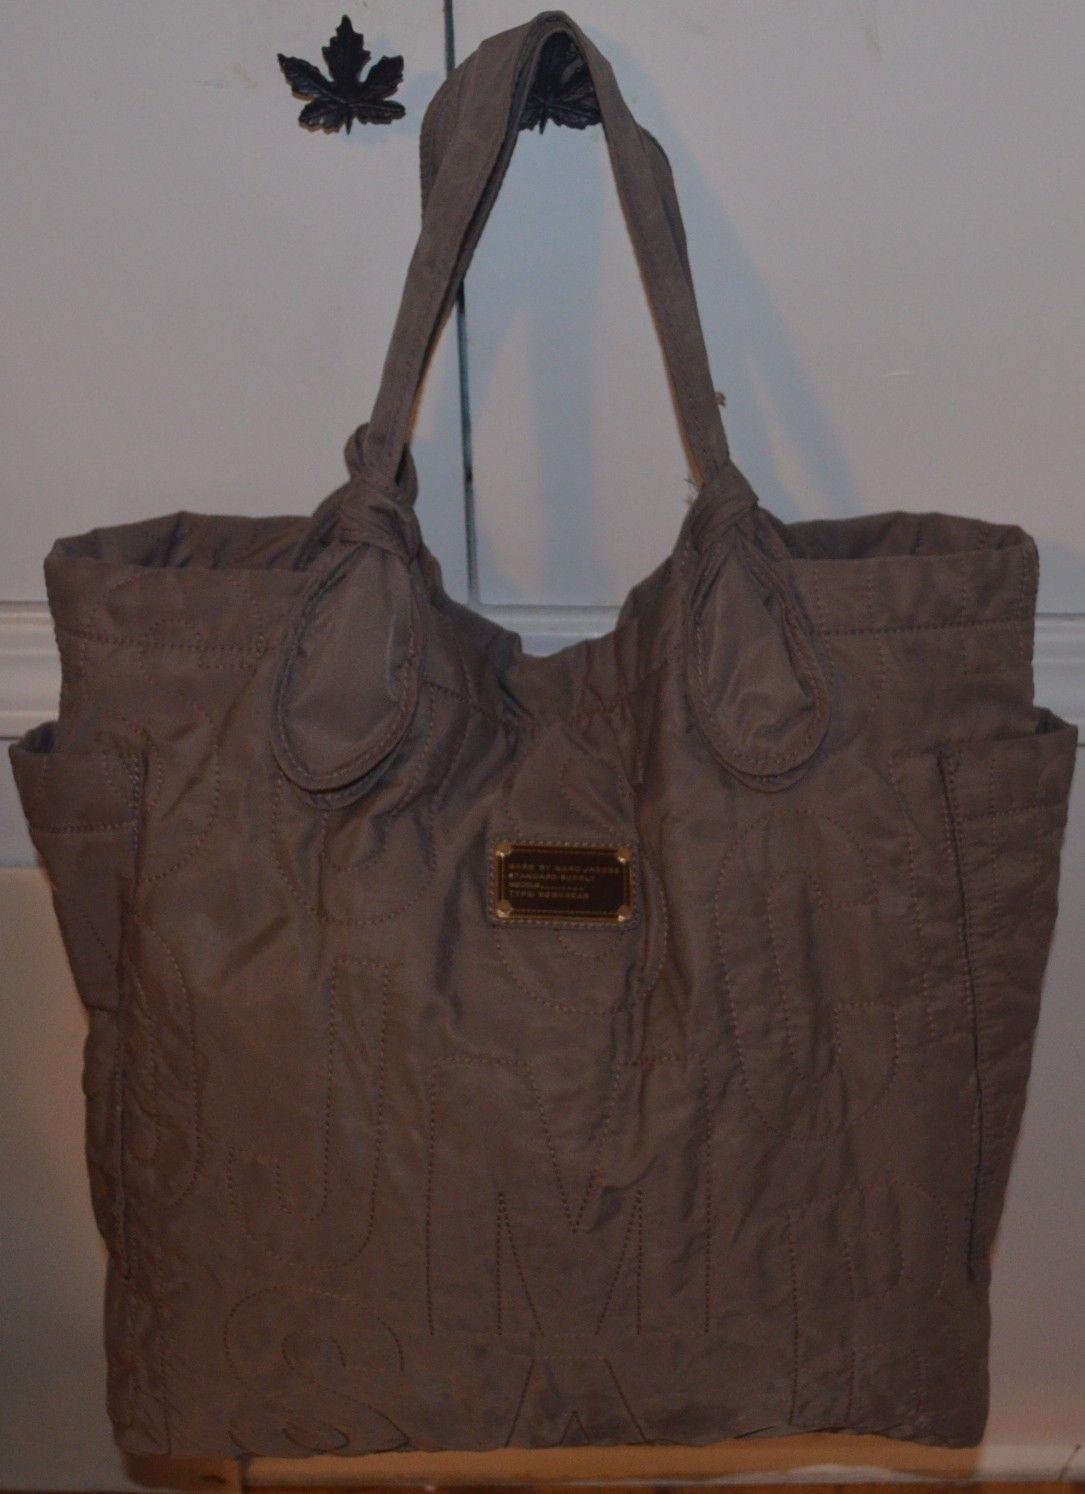 2b11e975b2 MARC BY MARC JACOBS Pretty Nylon Tate Tote Quartz Grey Large Shopper Carry  Bag